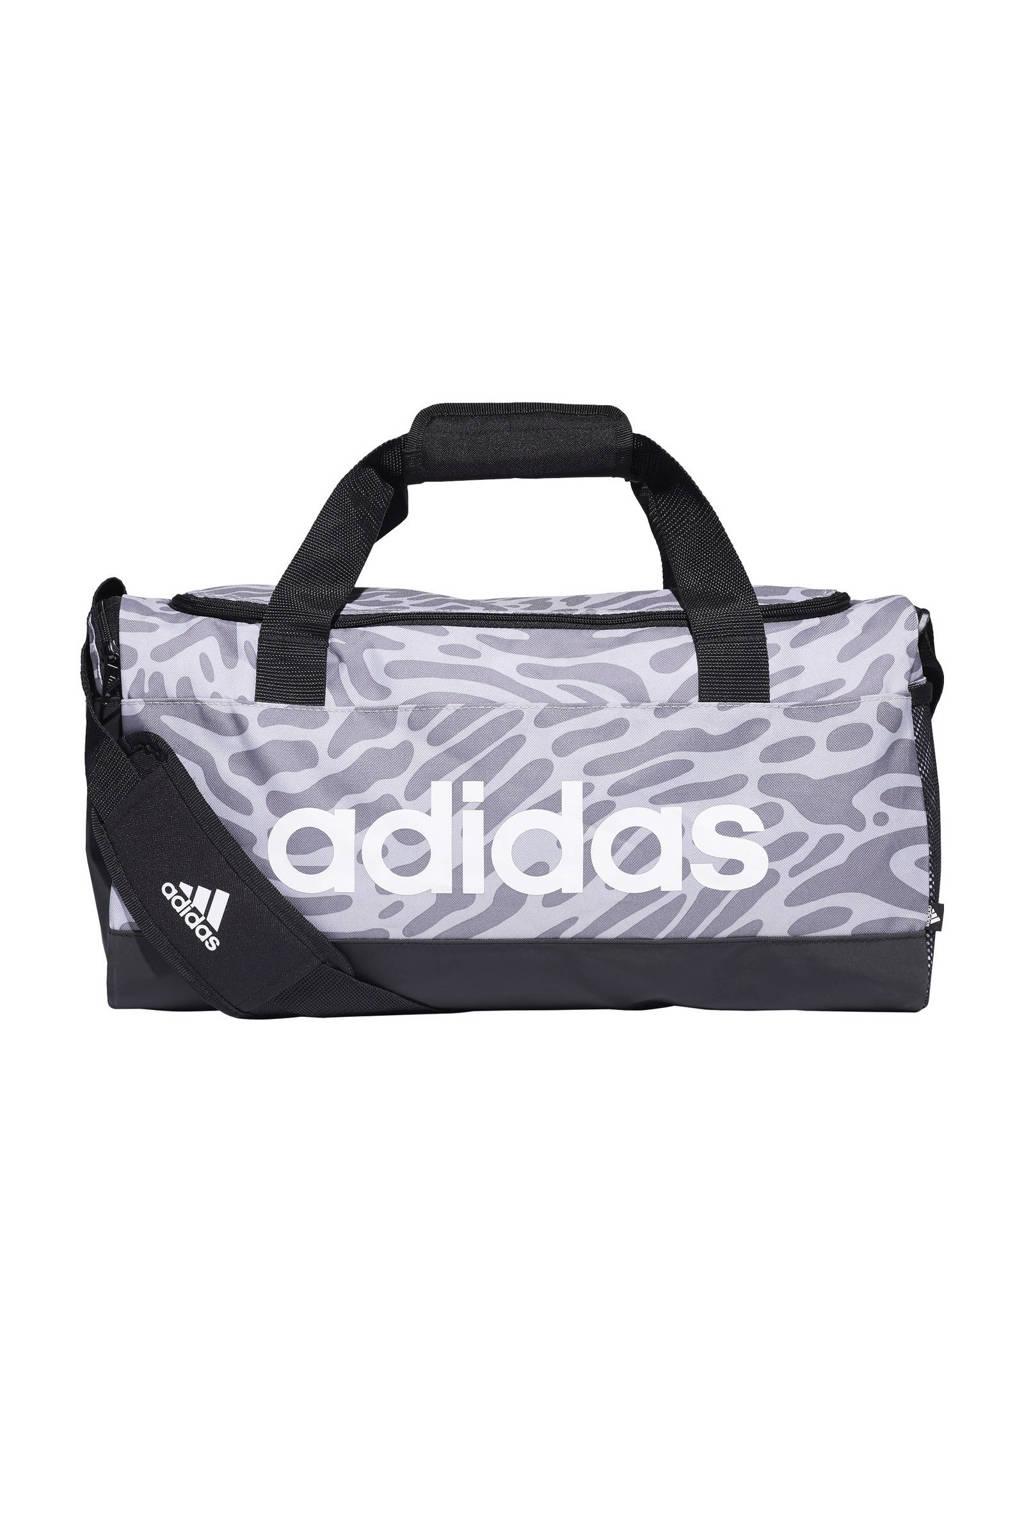 adidas Performance   sporttas Duffel F zwart/wit/grijs, Zwart/wit